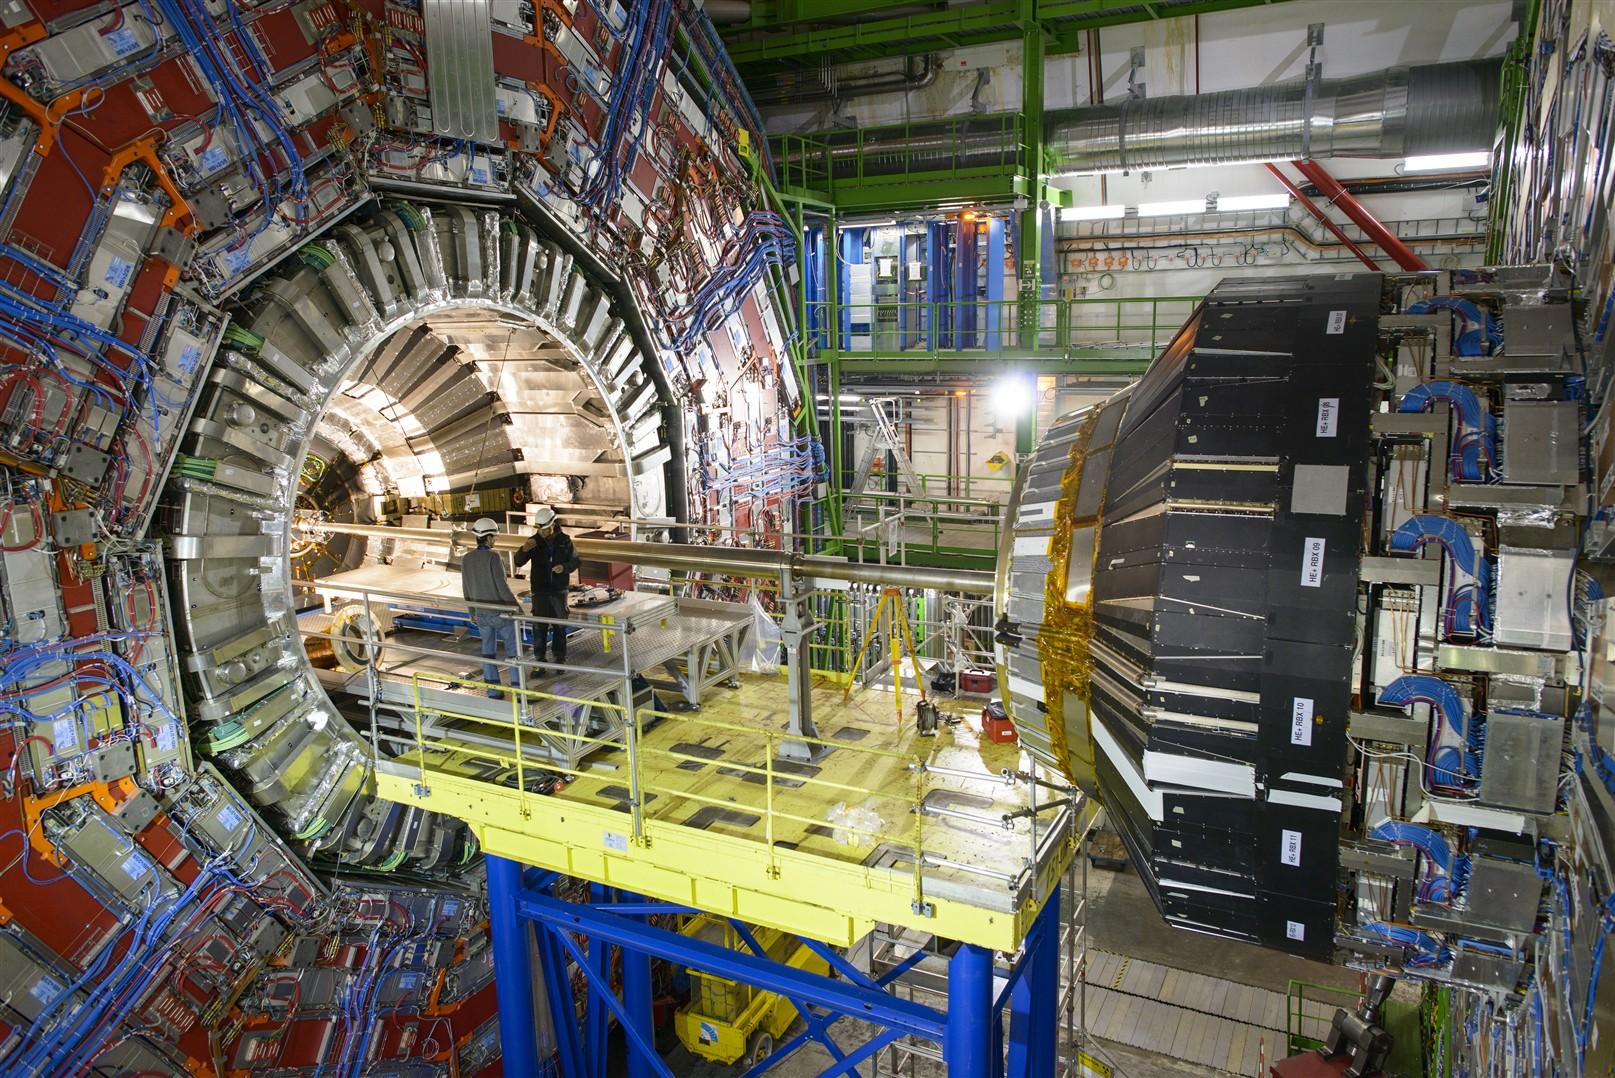 Short-Circuit-Stalls-Large-Hadron-Colliders-Restart1